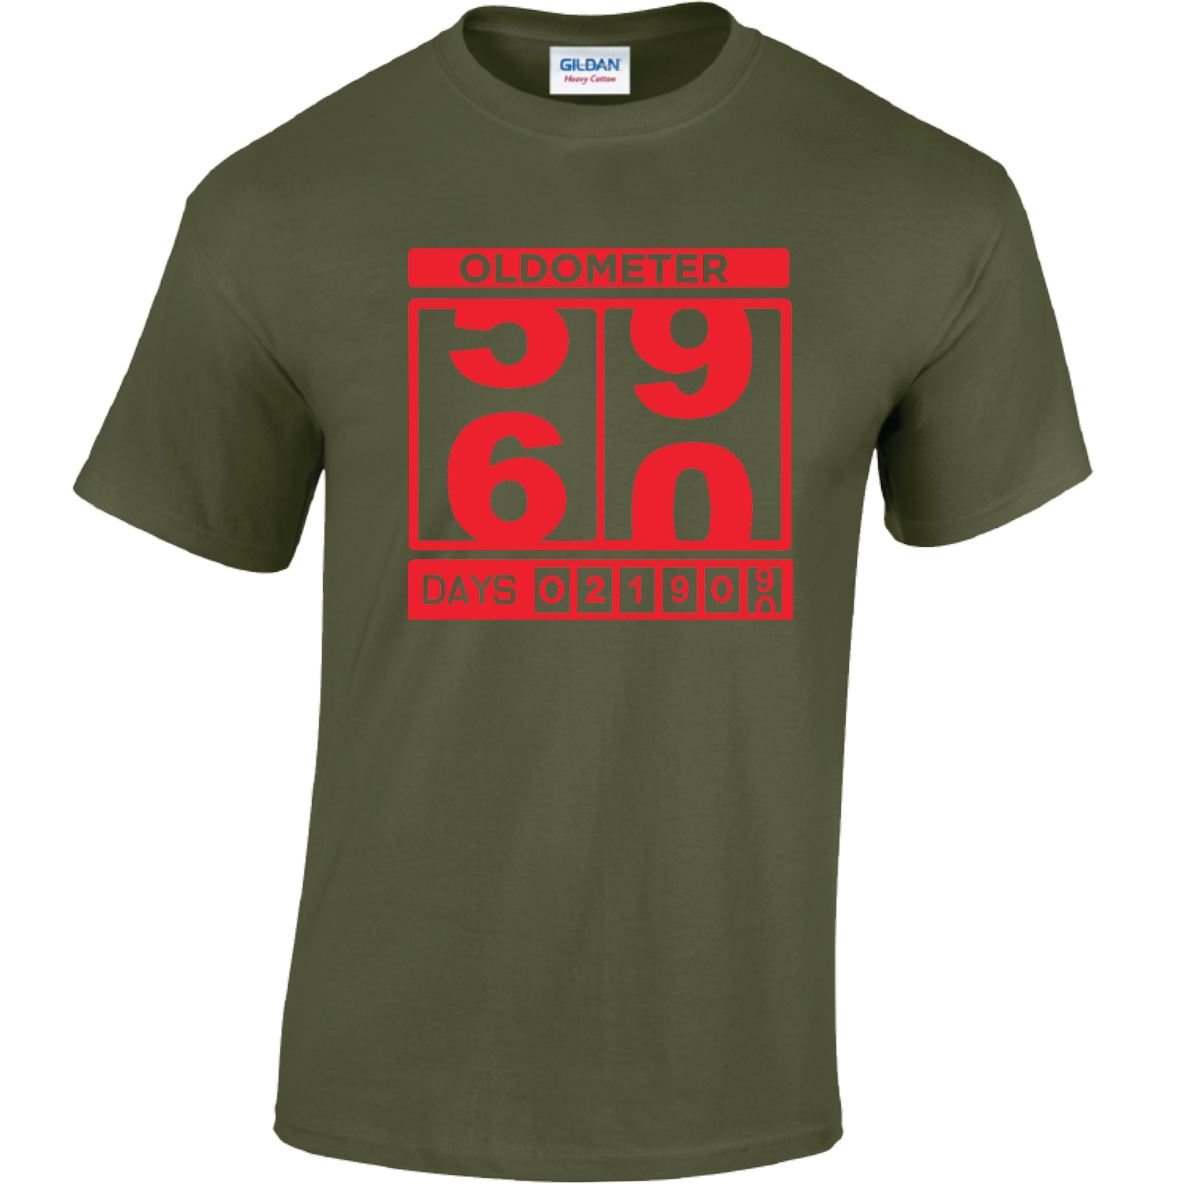 Oldometer 4950 Days Funny Novelty T-Shirt Mens tee TShirt